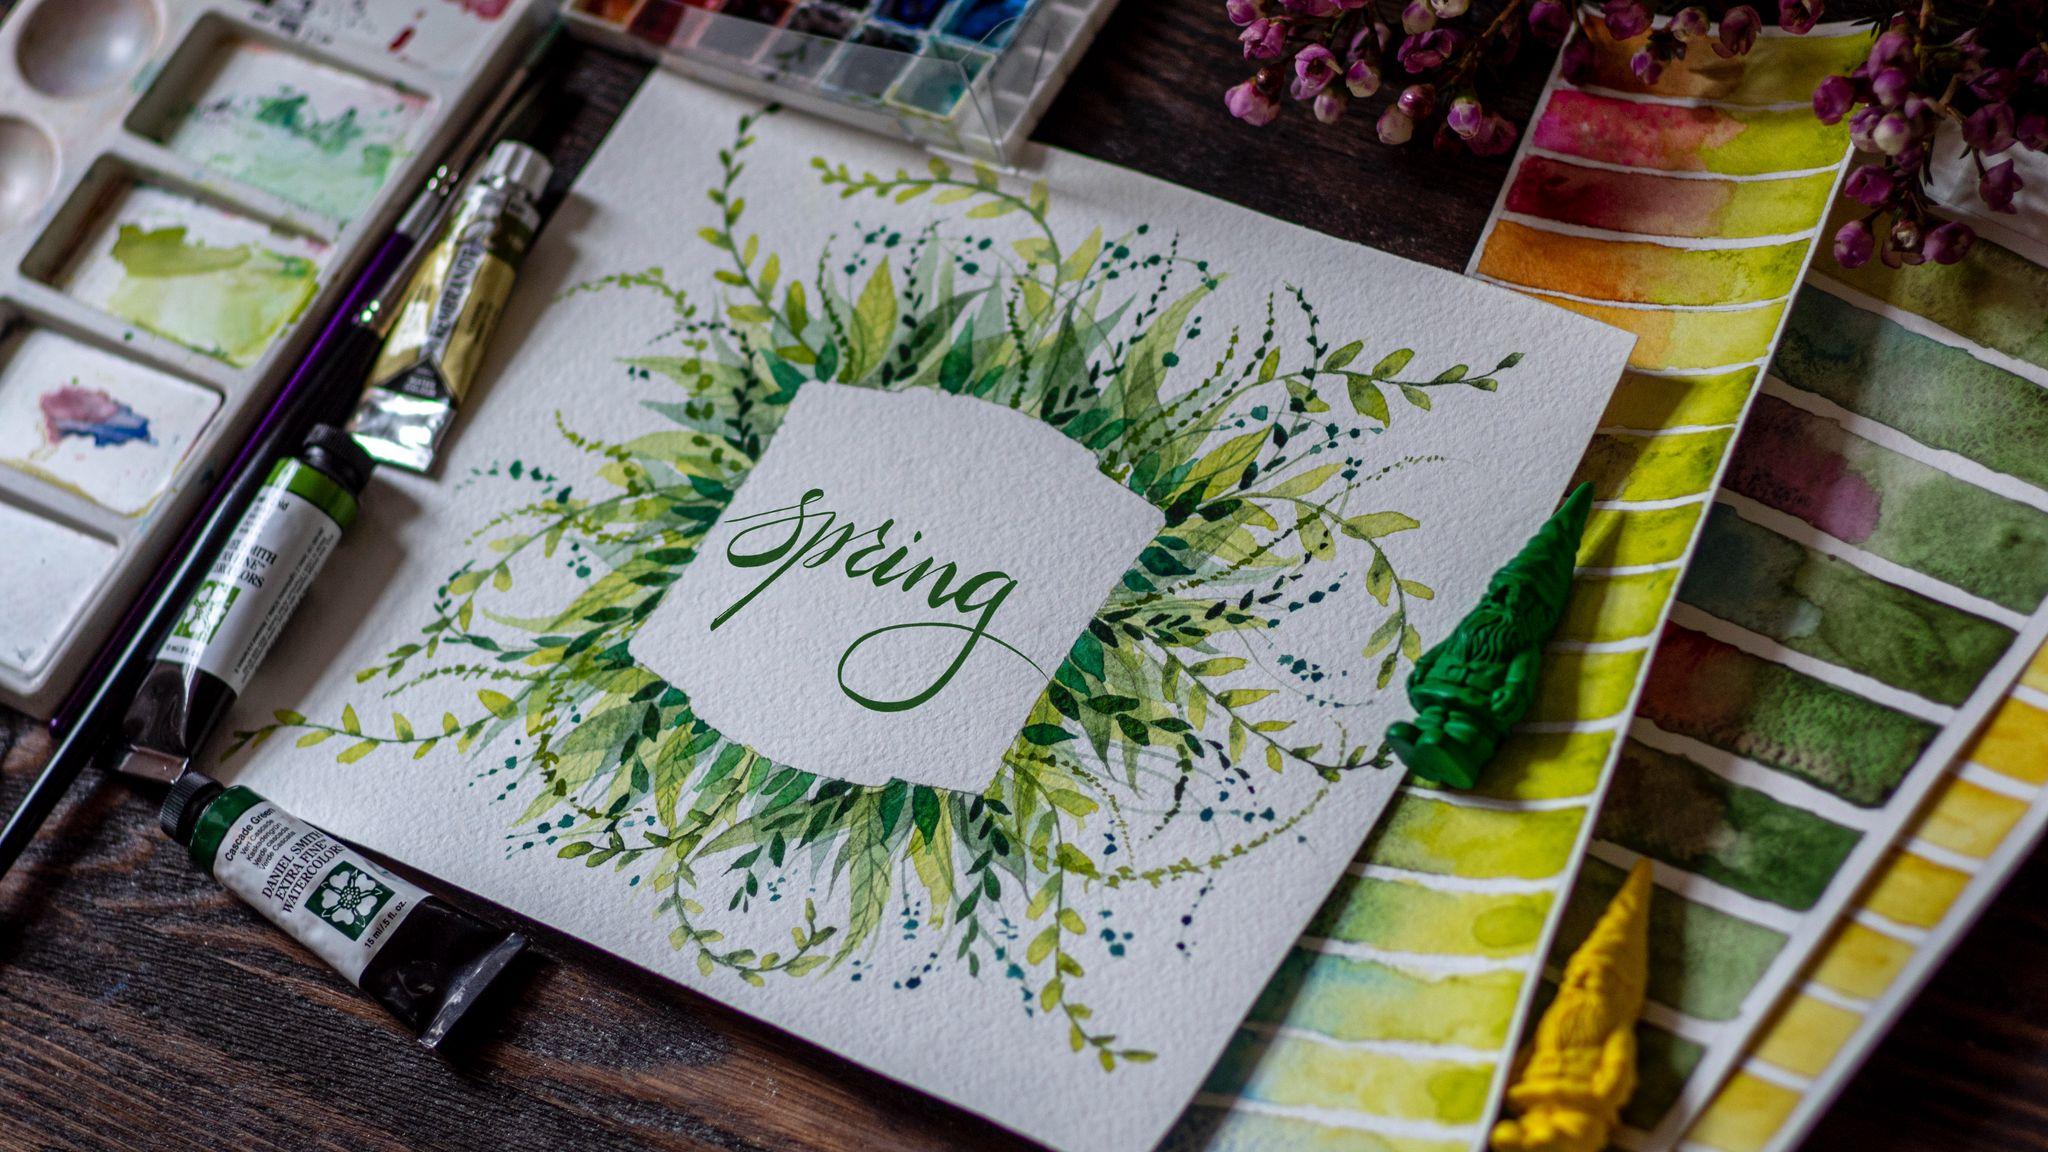 2048x1152 Обои весна, слово, леттеринг, краски, акварель